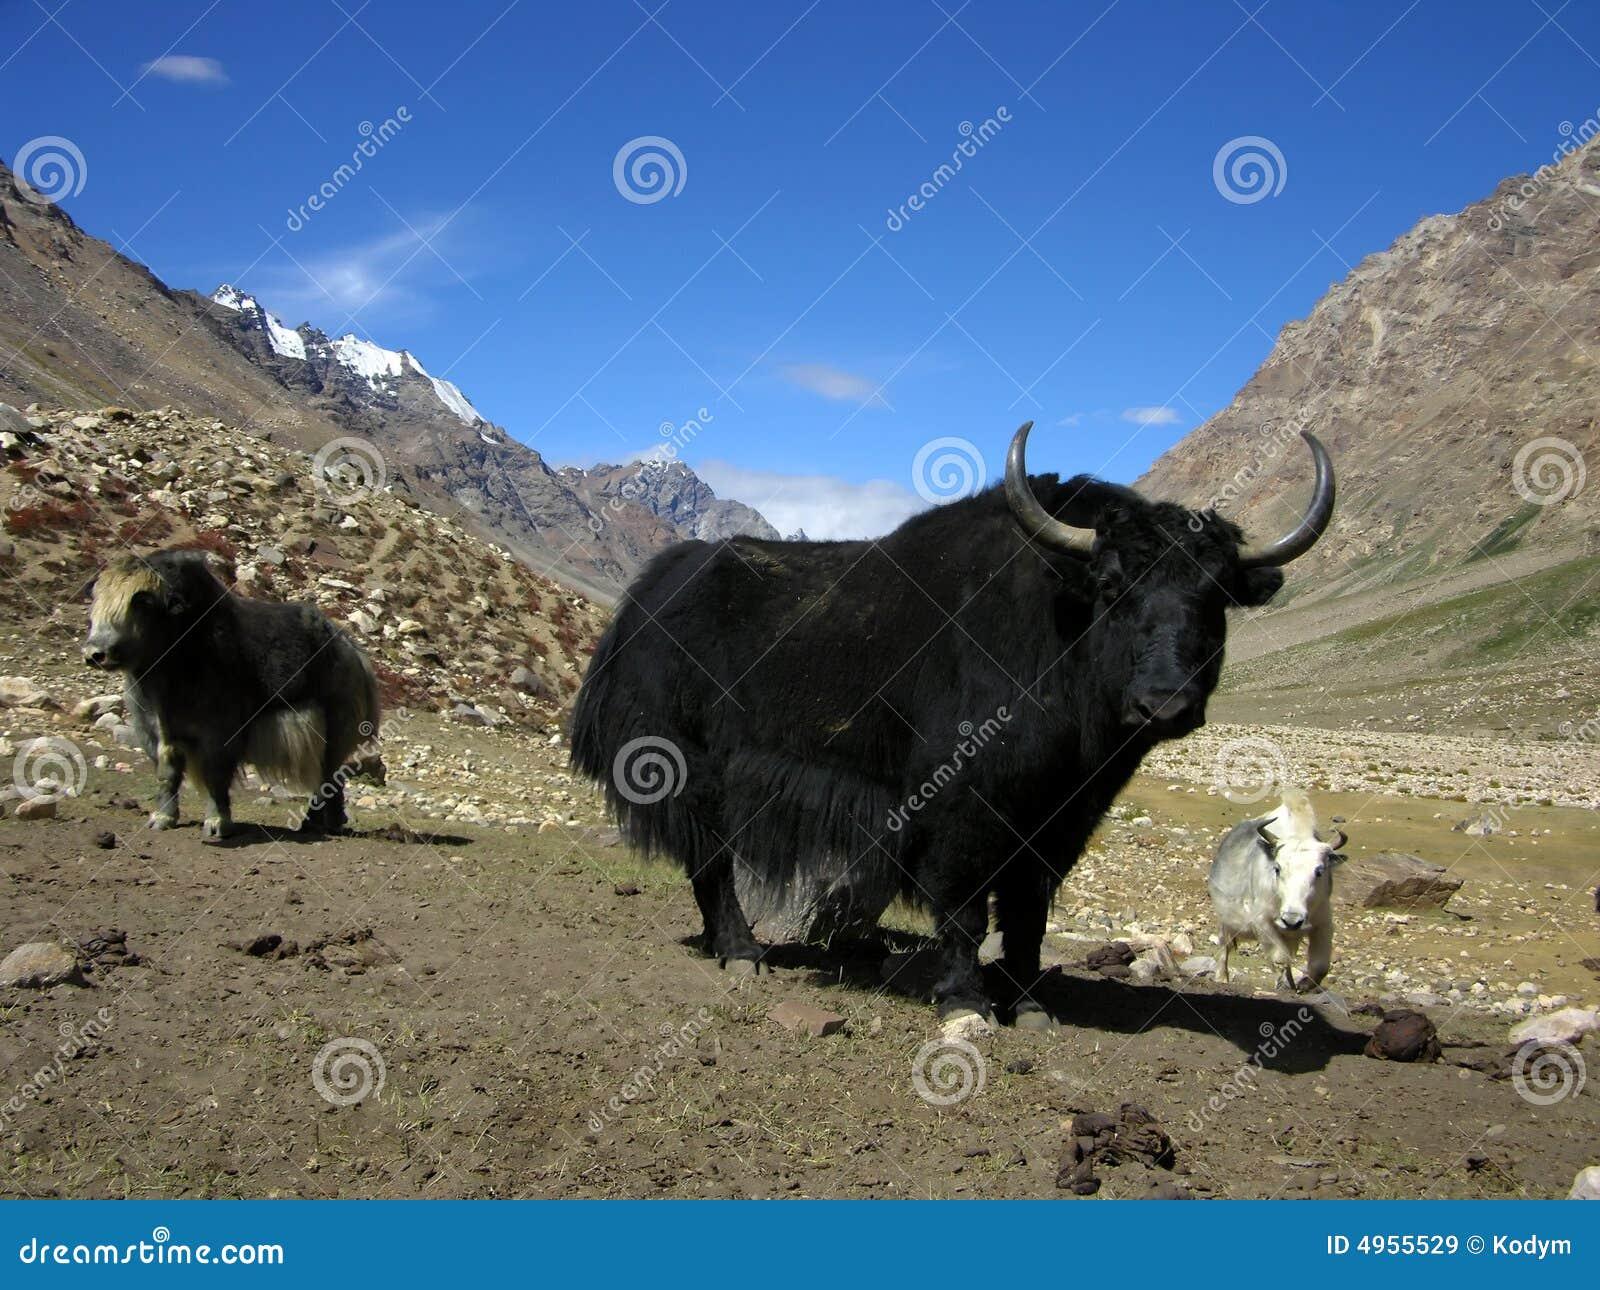 Heard of yaks